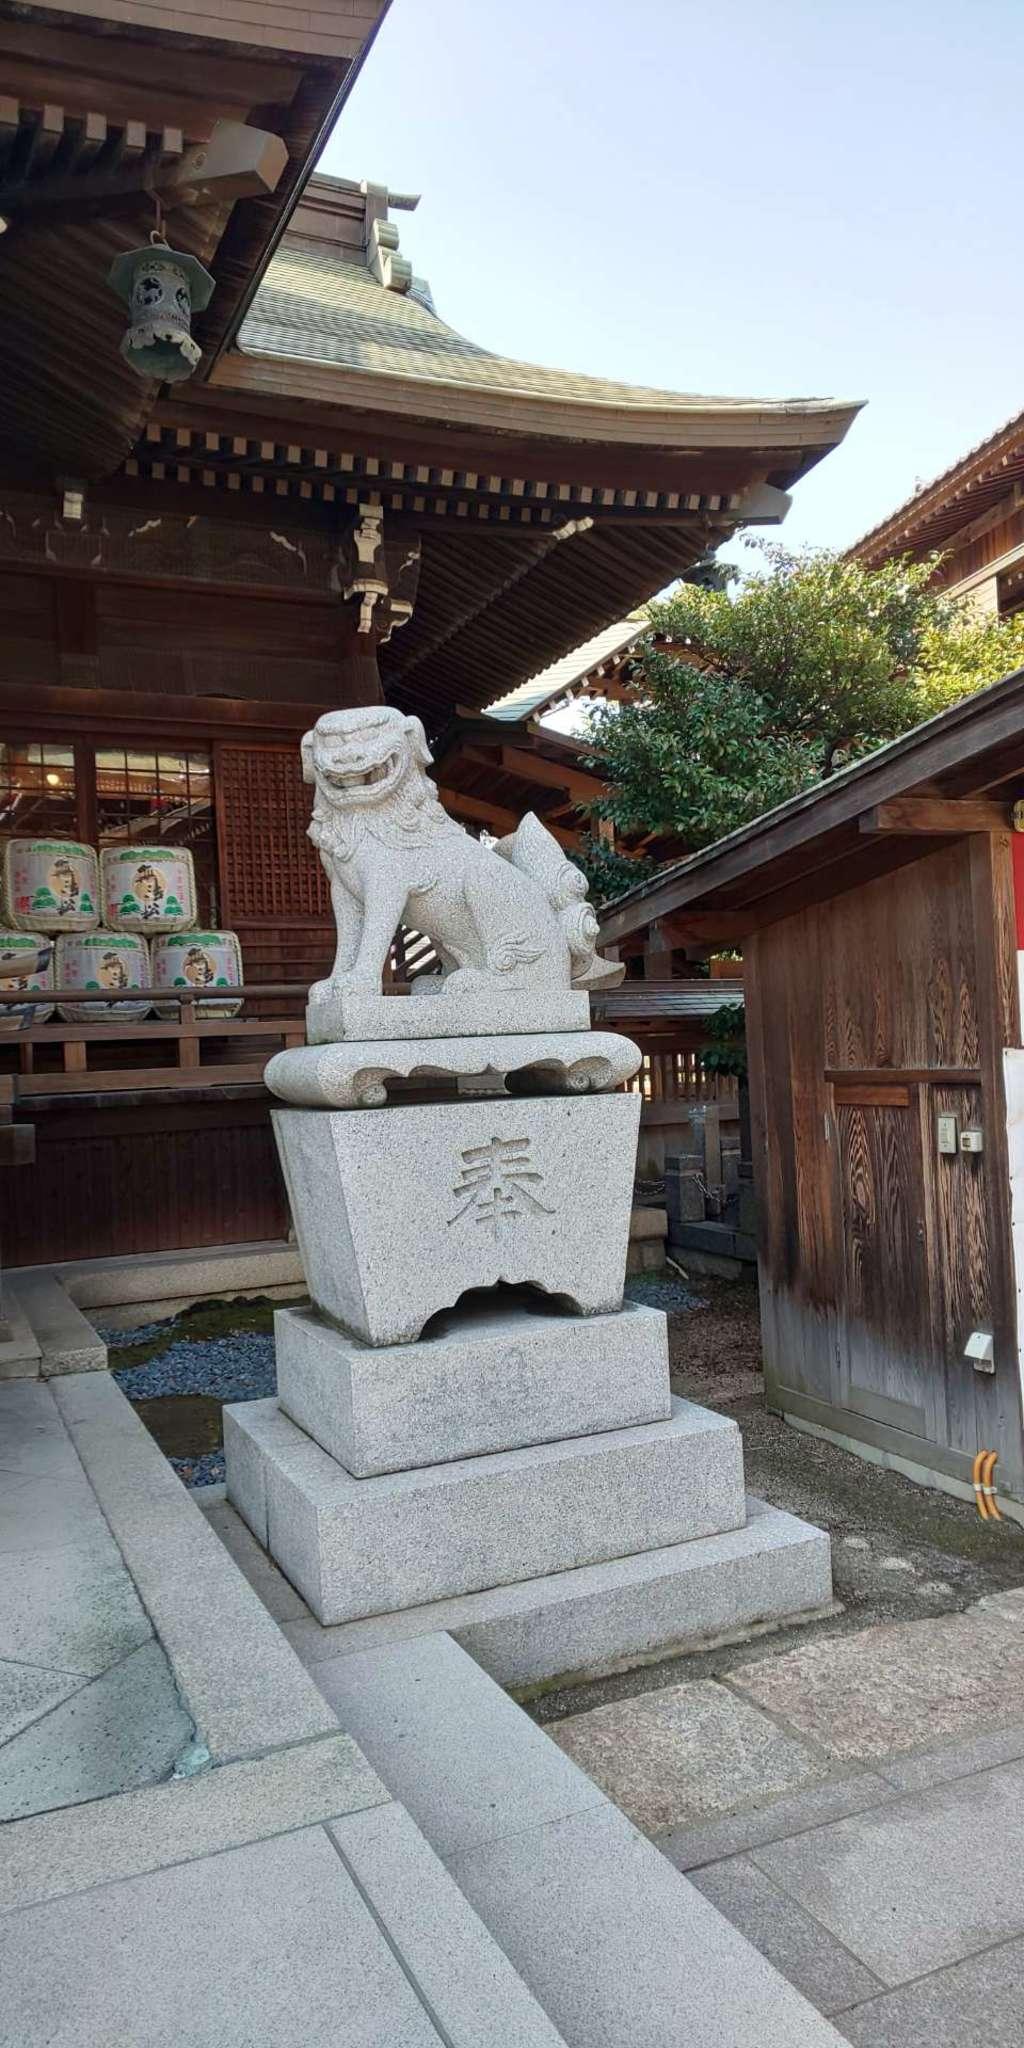 小倉祇園八坂神社の狛犬